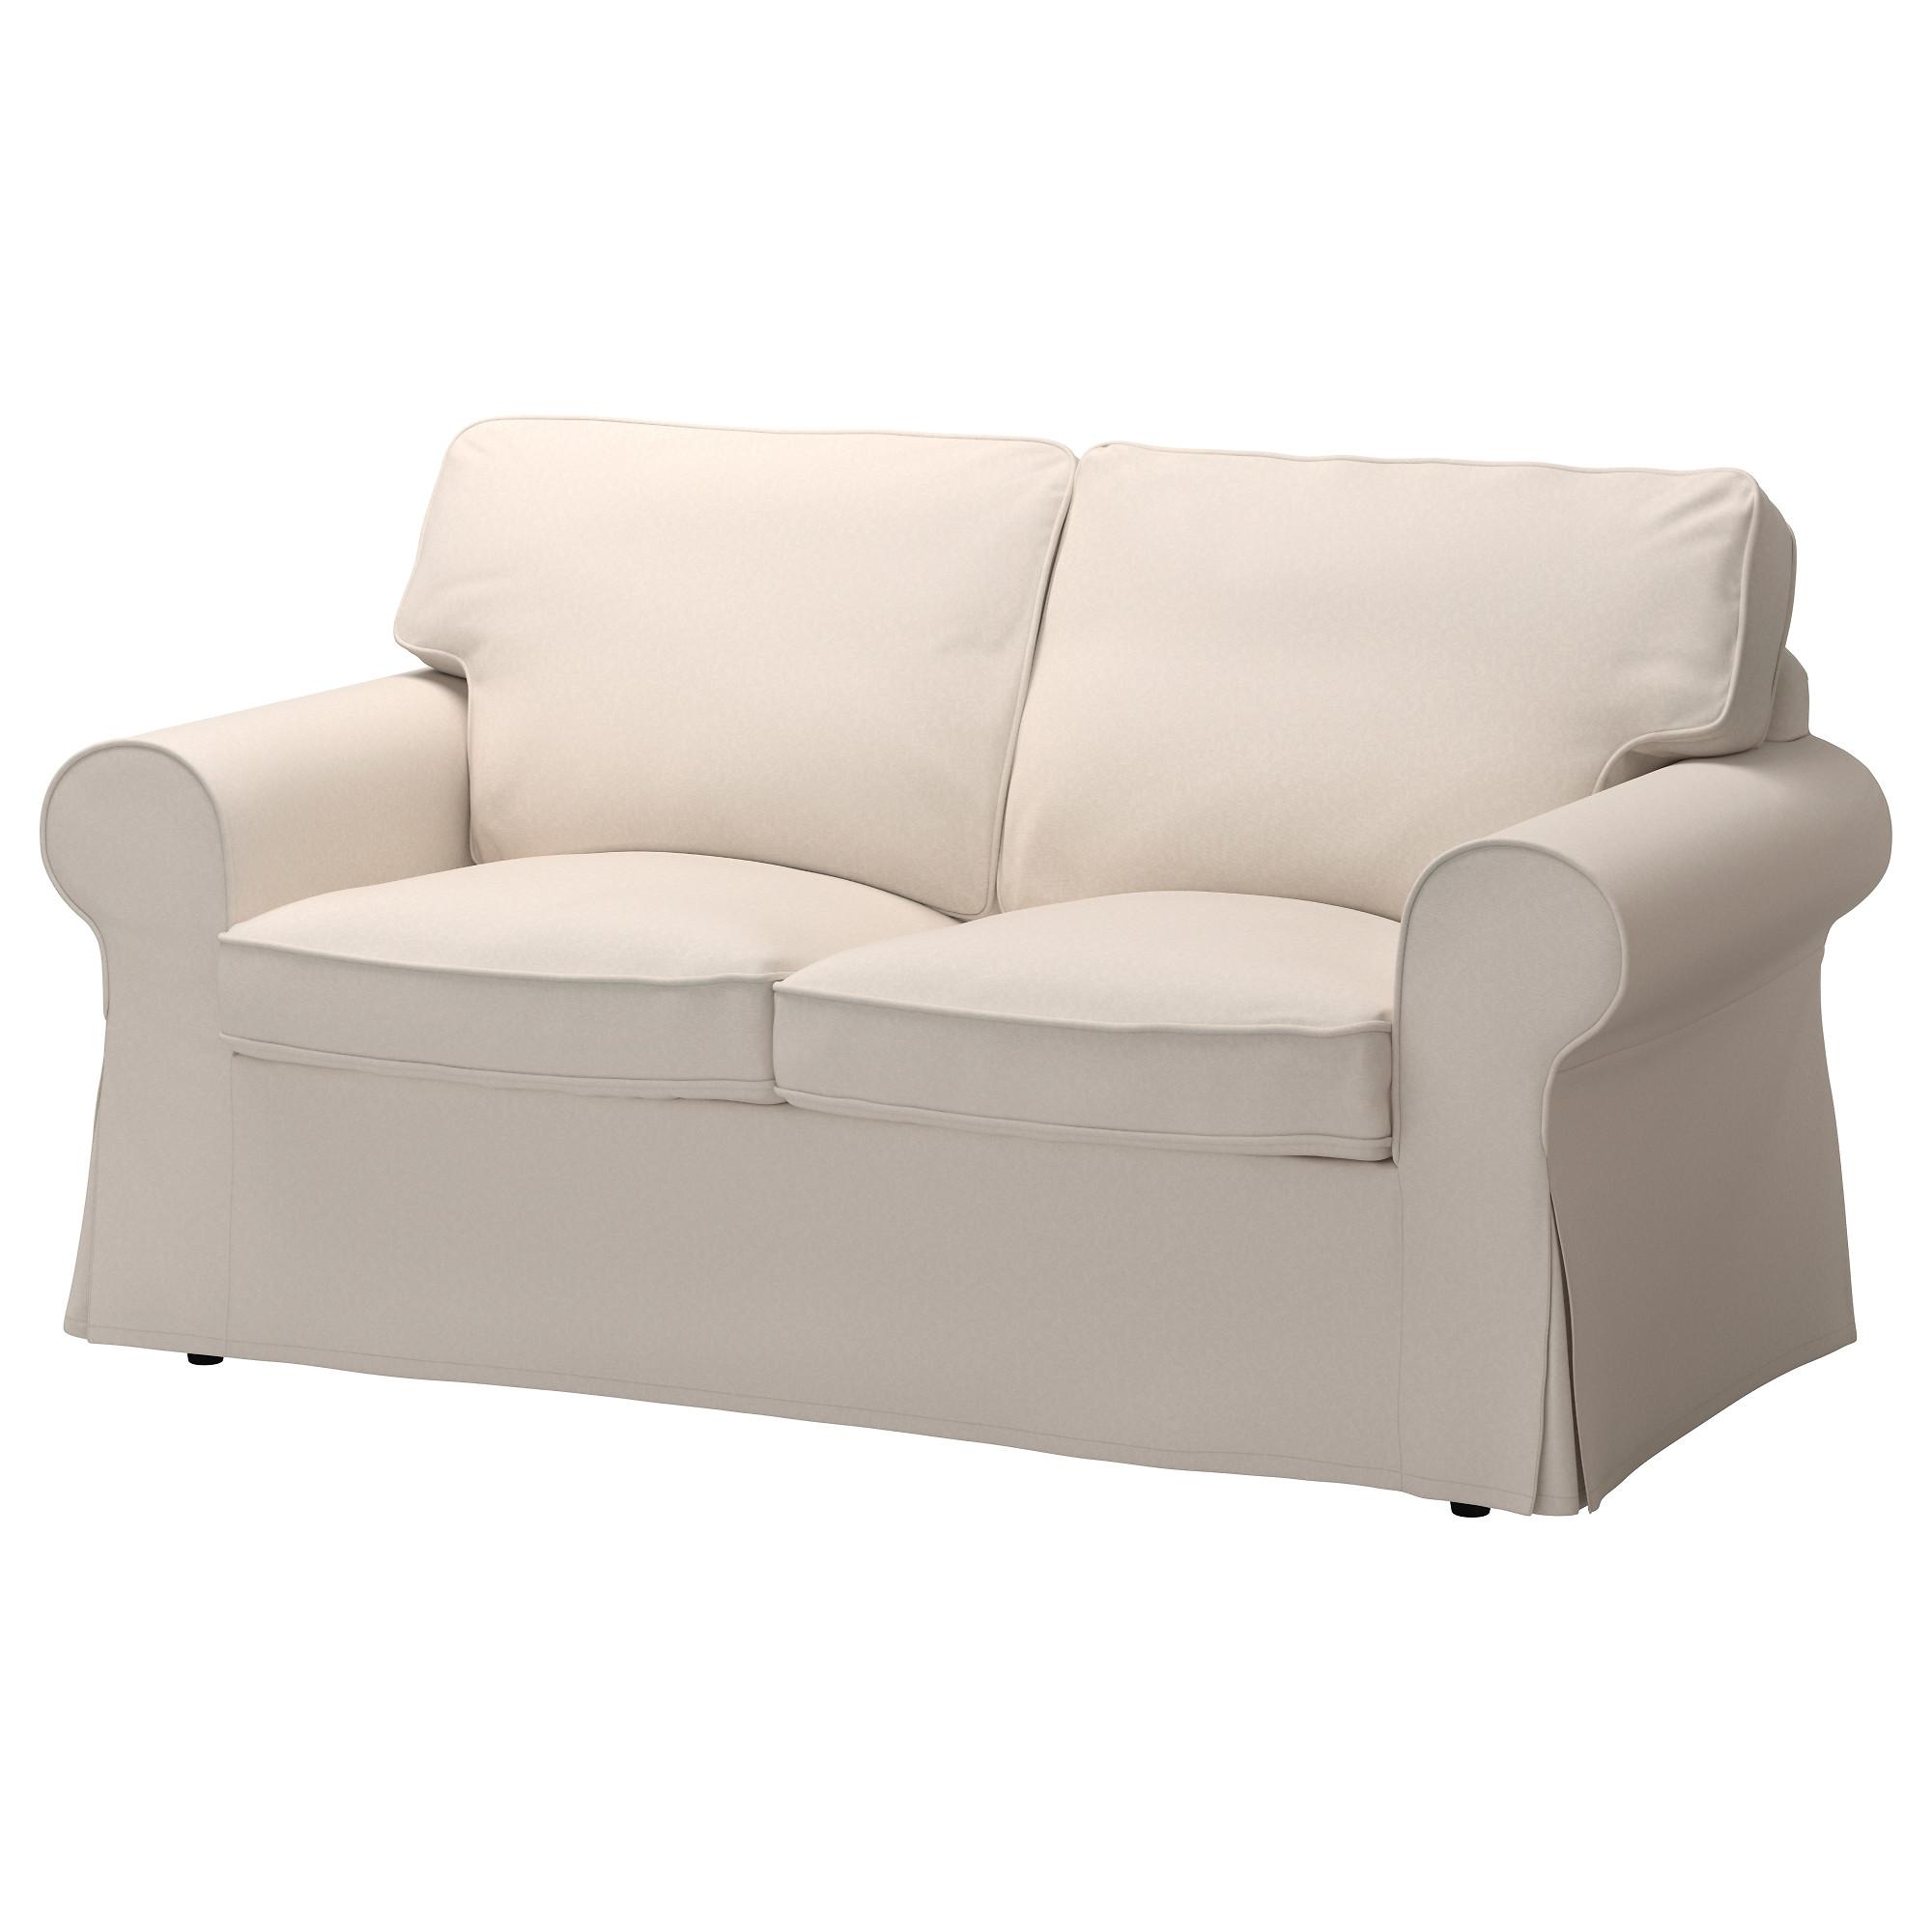 Ektorp Loveseat Lofallet Beige Ikea Love Seat Ikea Sofa Loveseat Covers